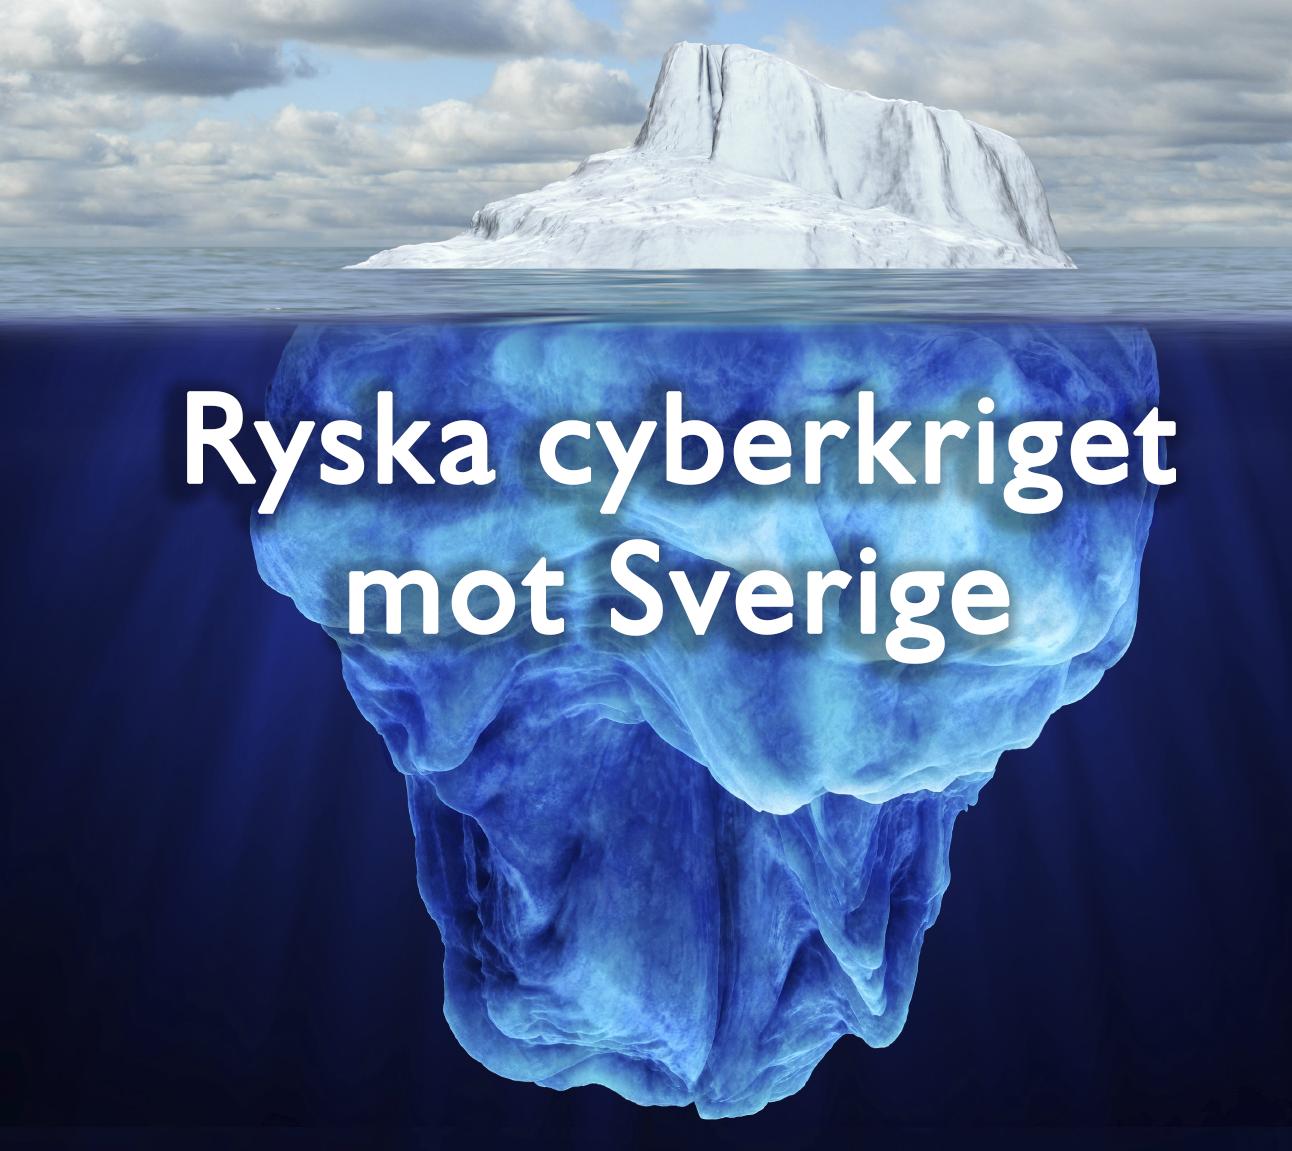 Ryska cyberkriget mot Sverige